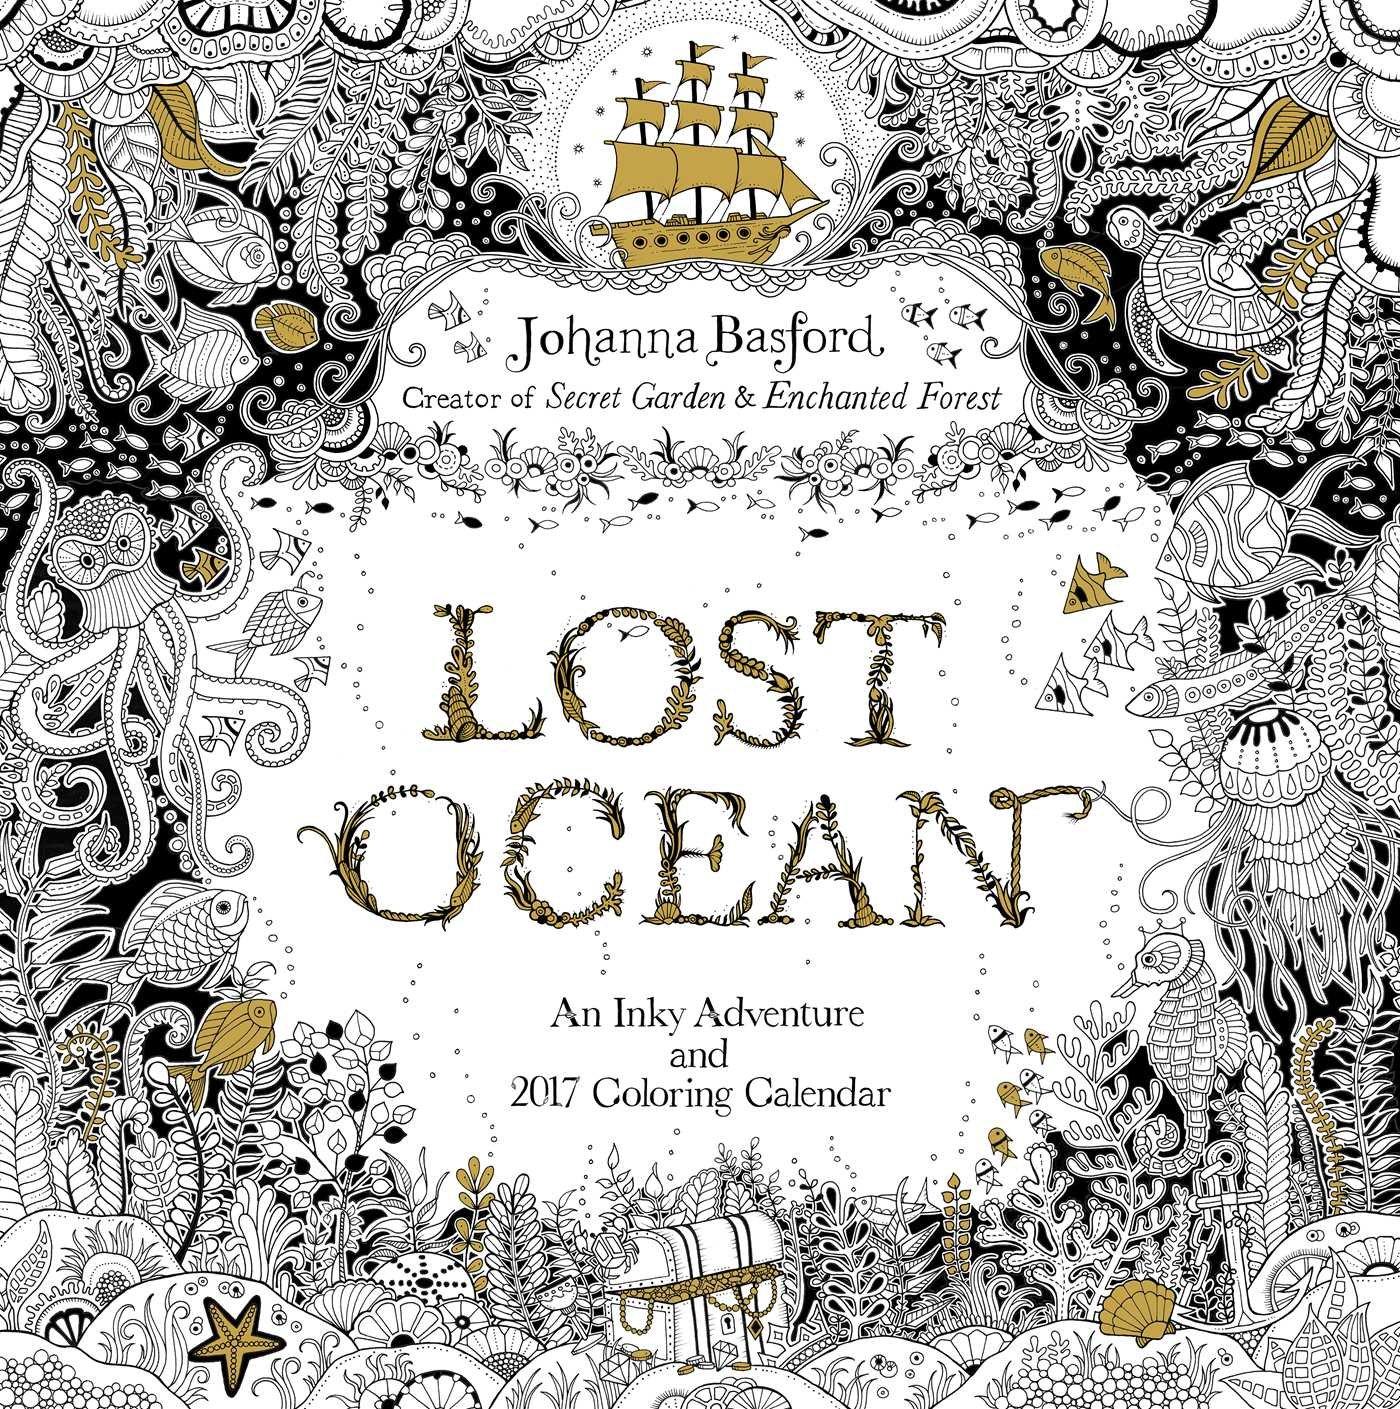 Lost Ocean 2017 Wall Calendar: An Inky Adventure and 2017 Coloring Calendar pdf